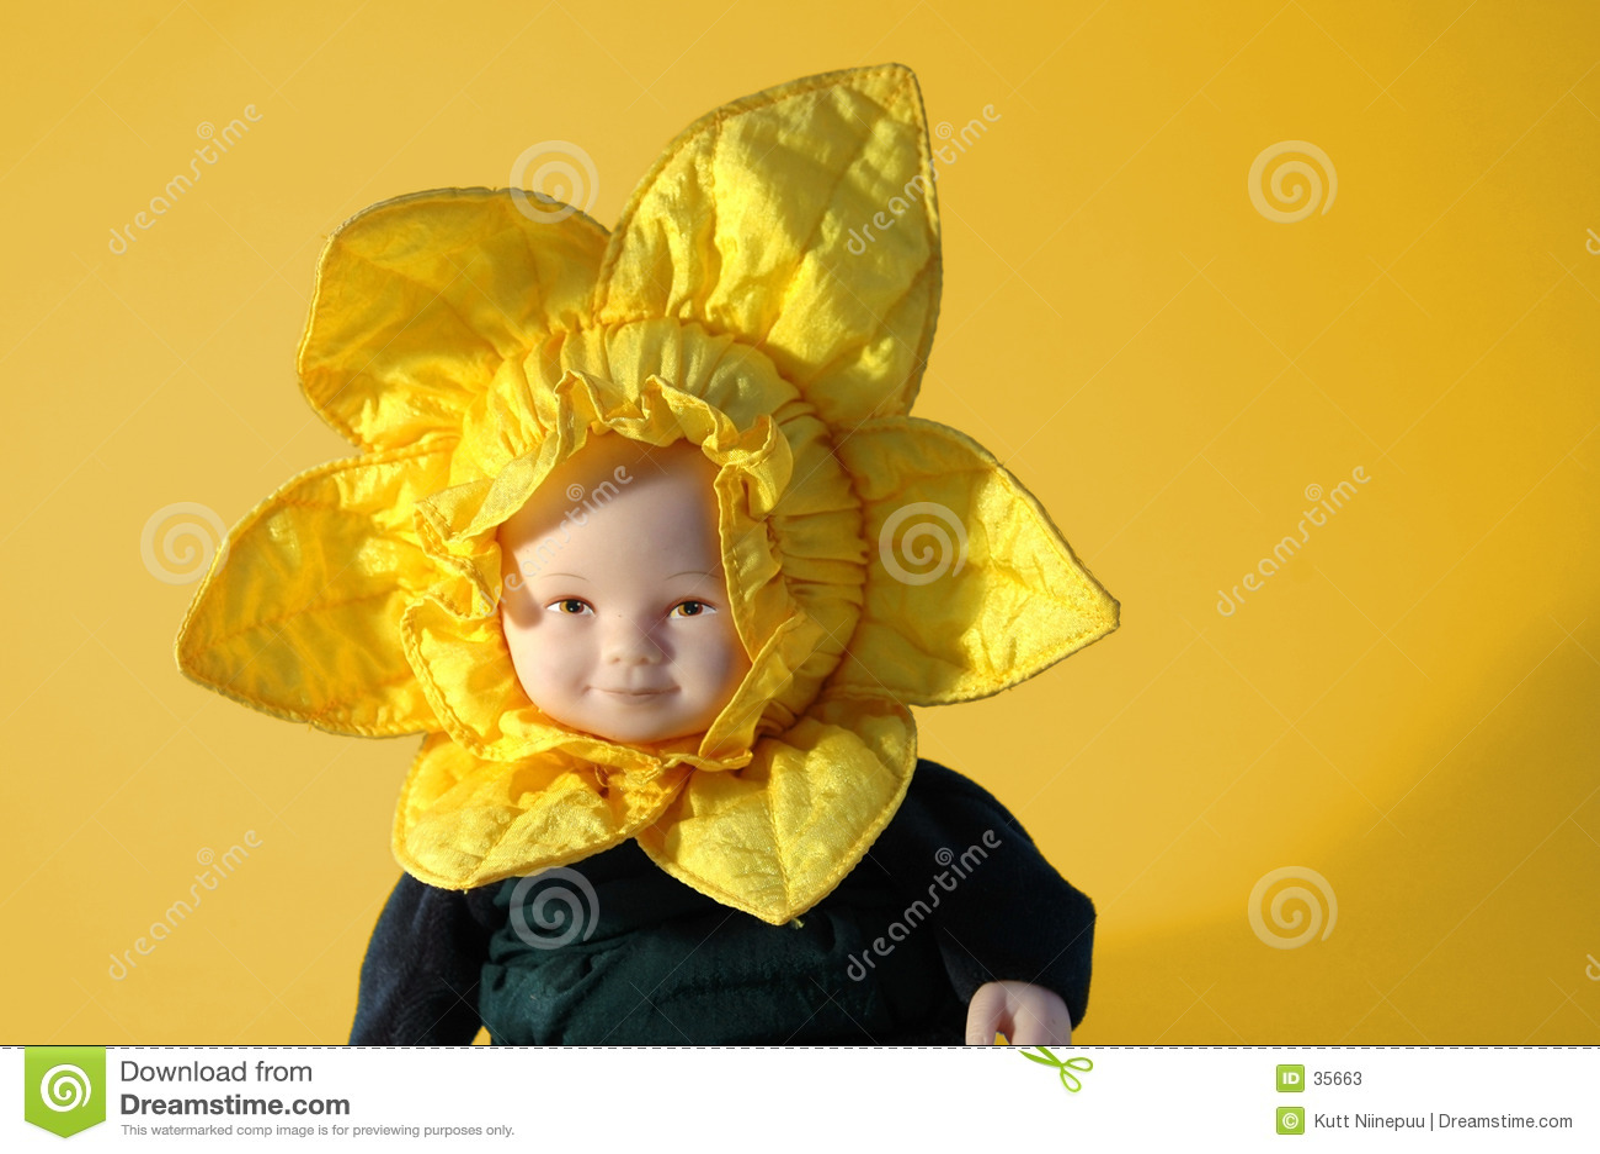 Sunflower Doll